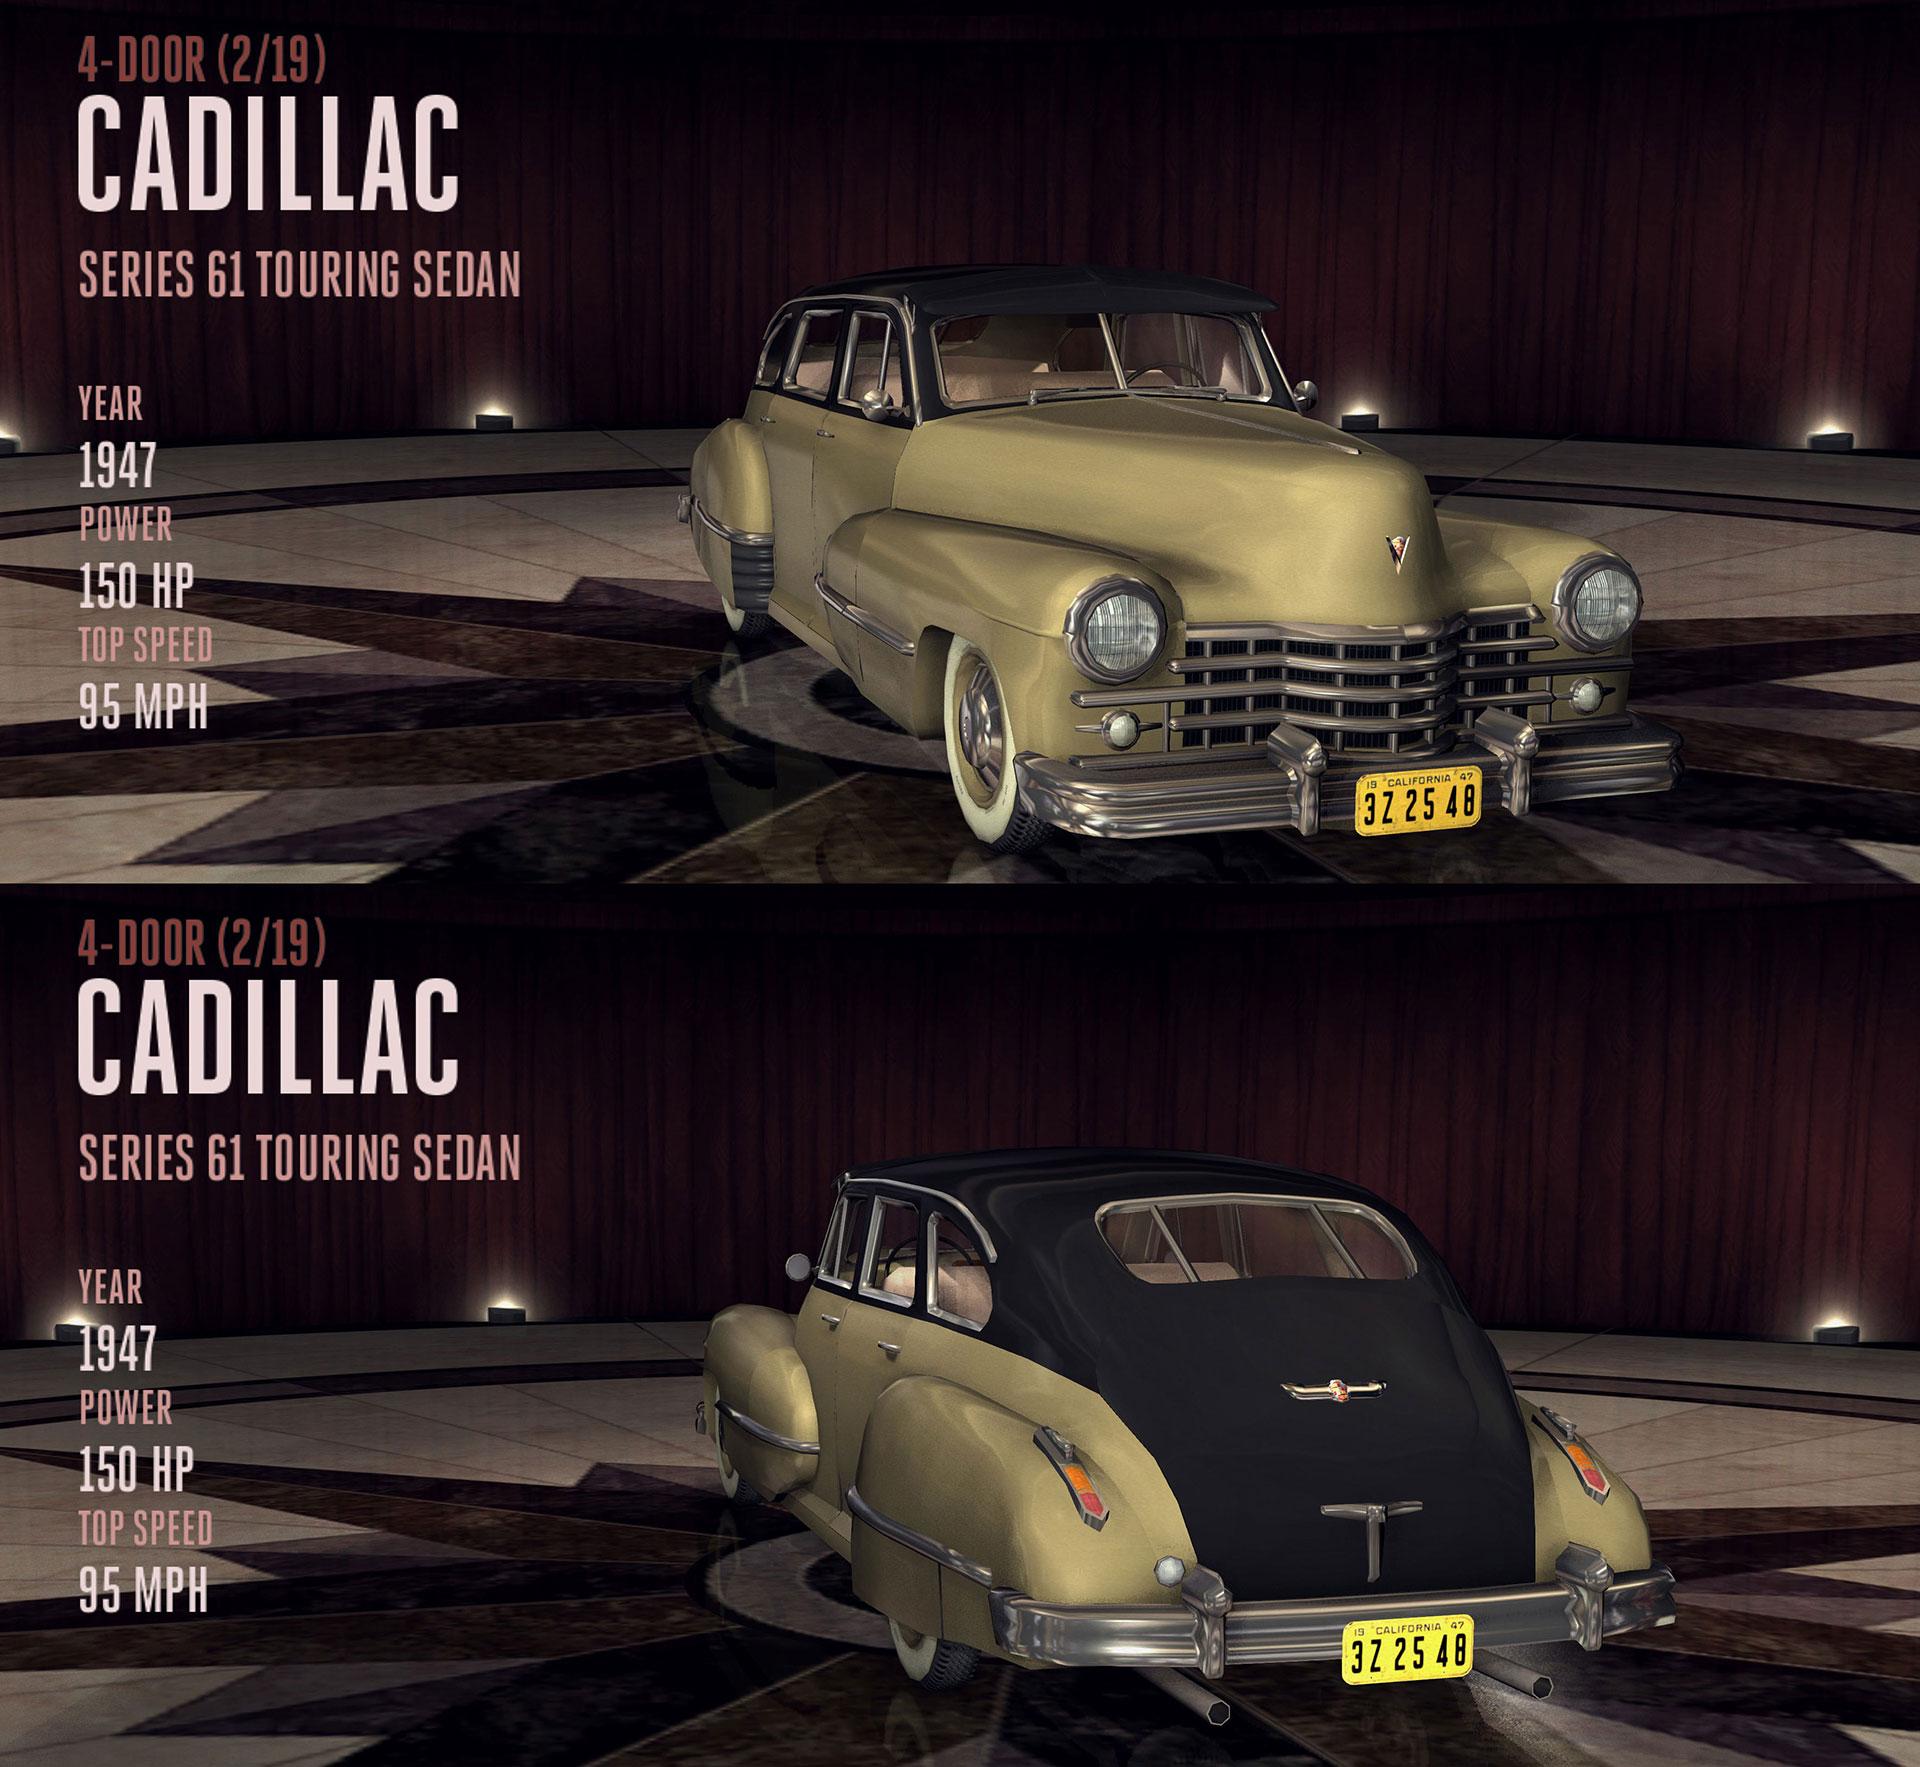 Archivo:1947-cadillac-series-61-touring-sedan.jpg